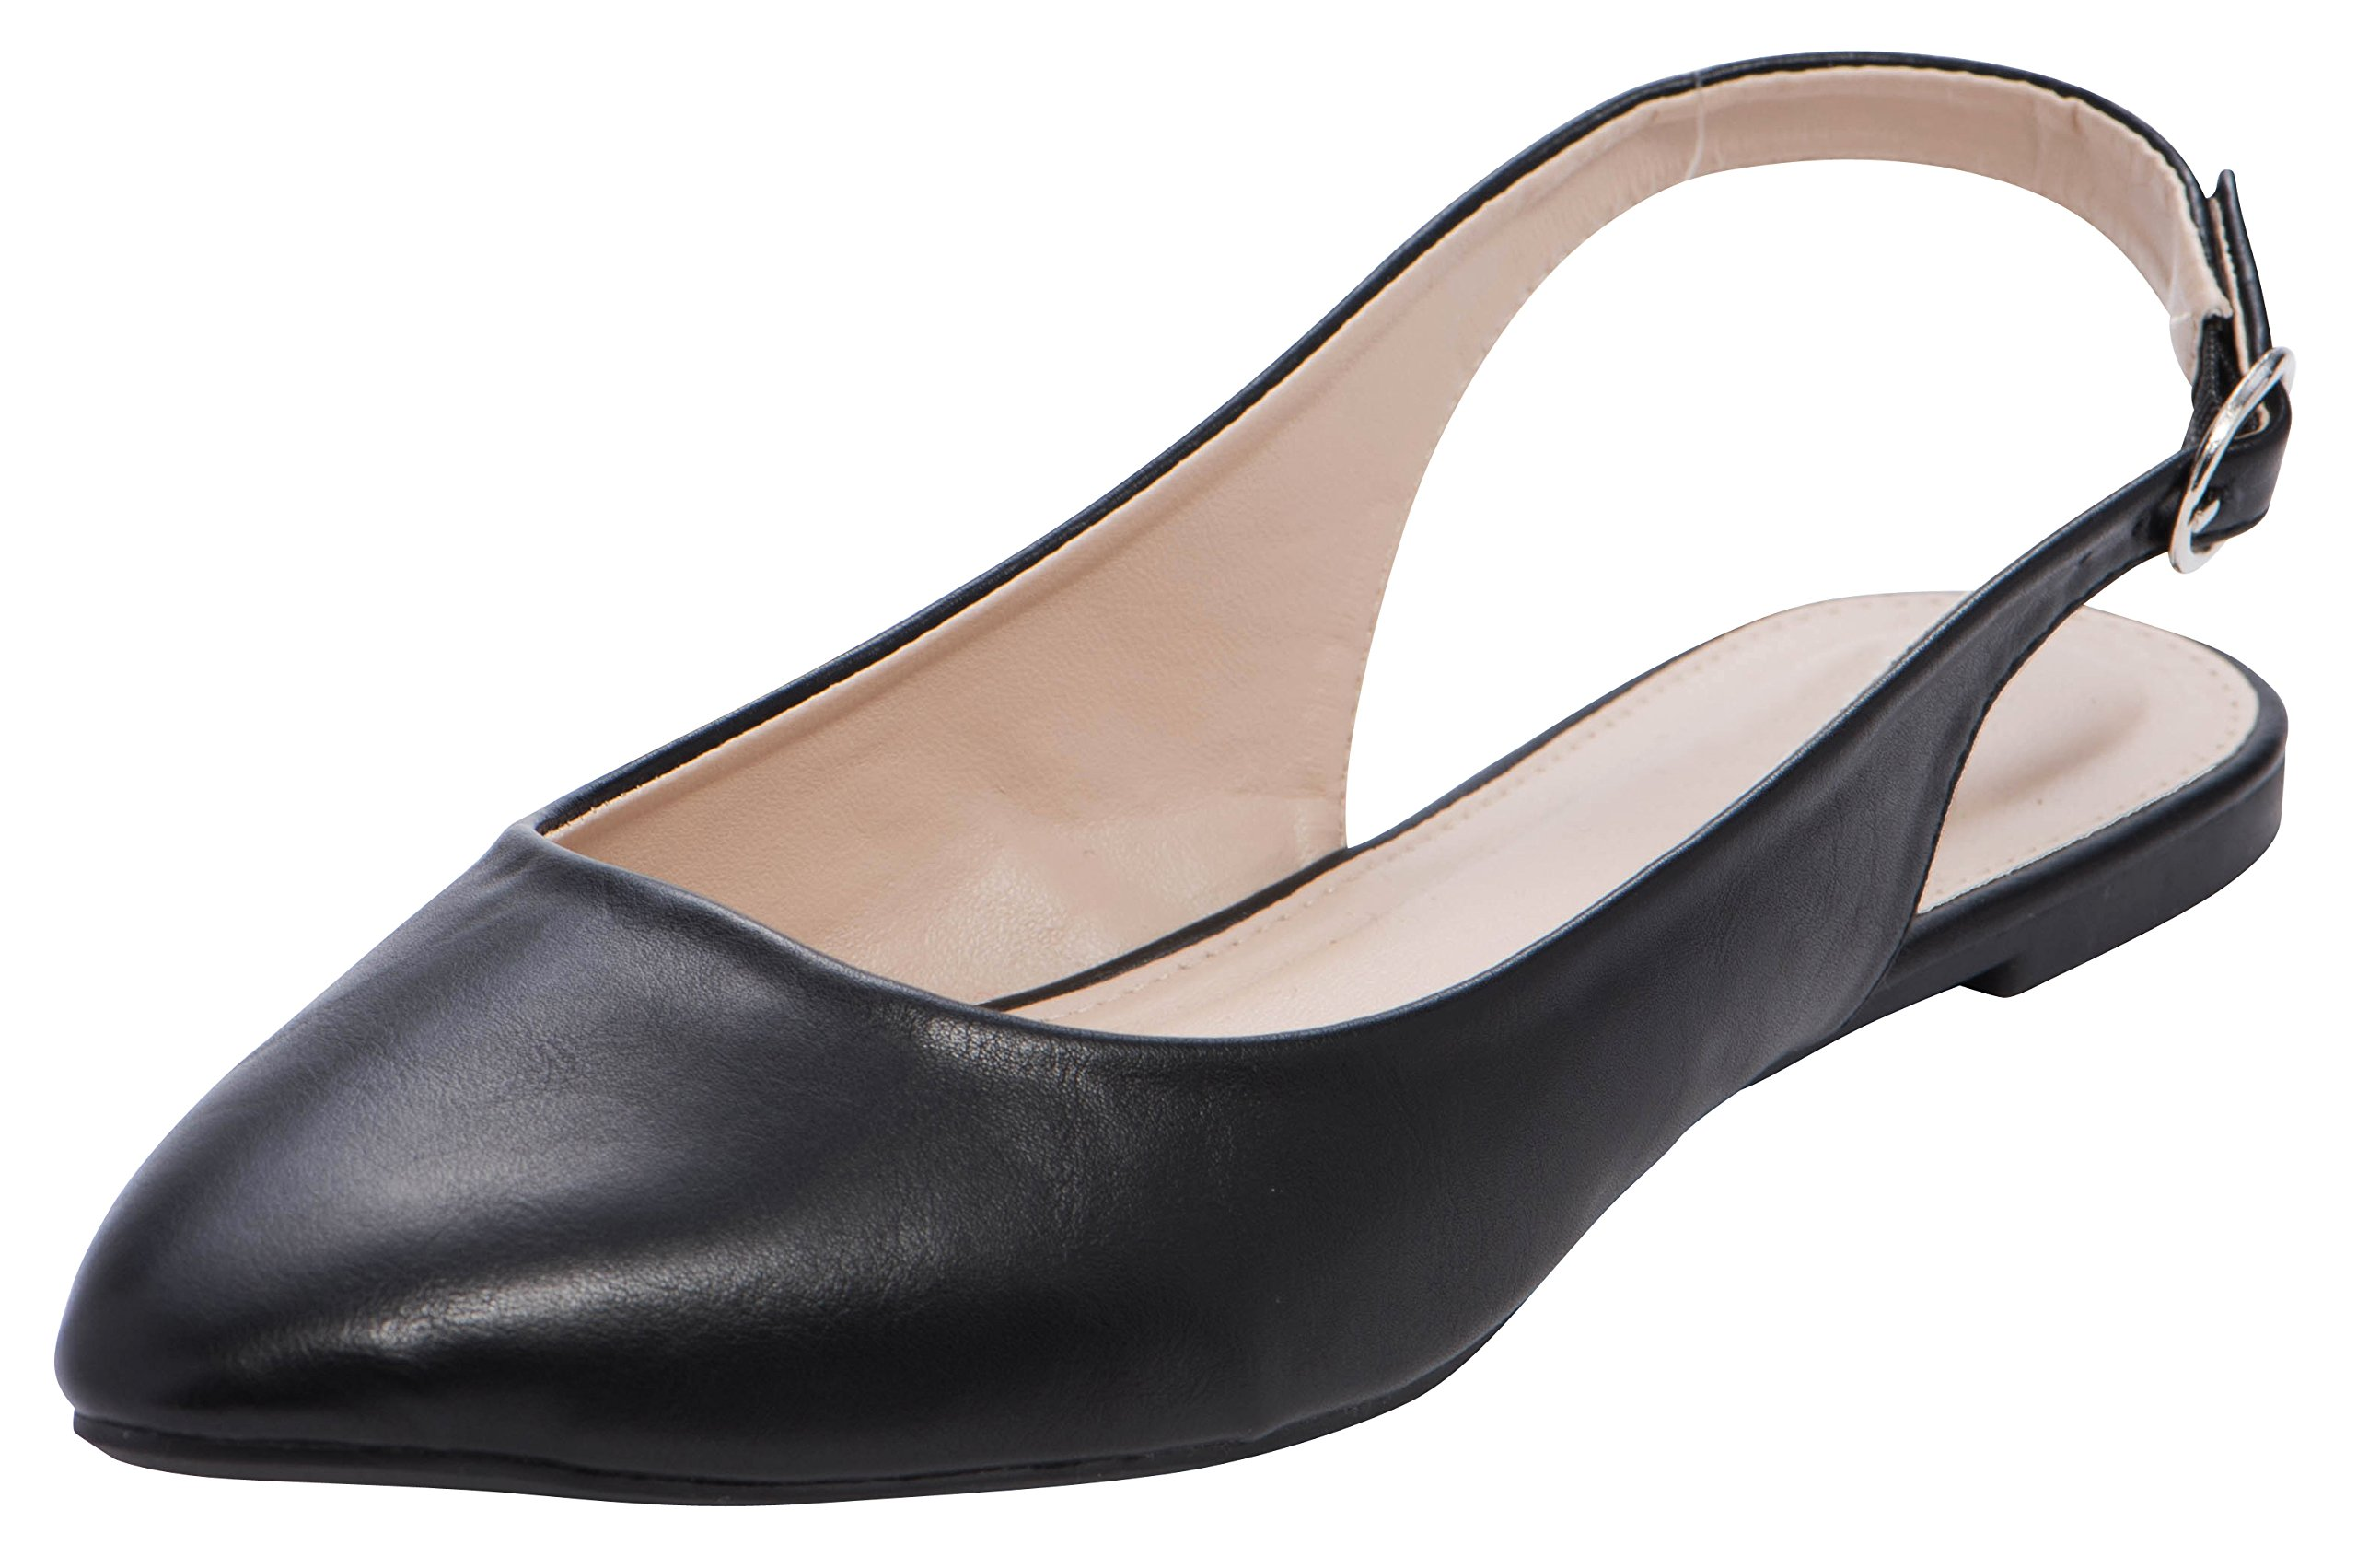 8d8d31b61ec Cambridge Select Women s Closed Pointed Toe Buckled Slingback Flat